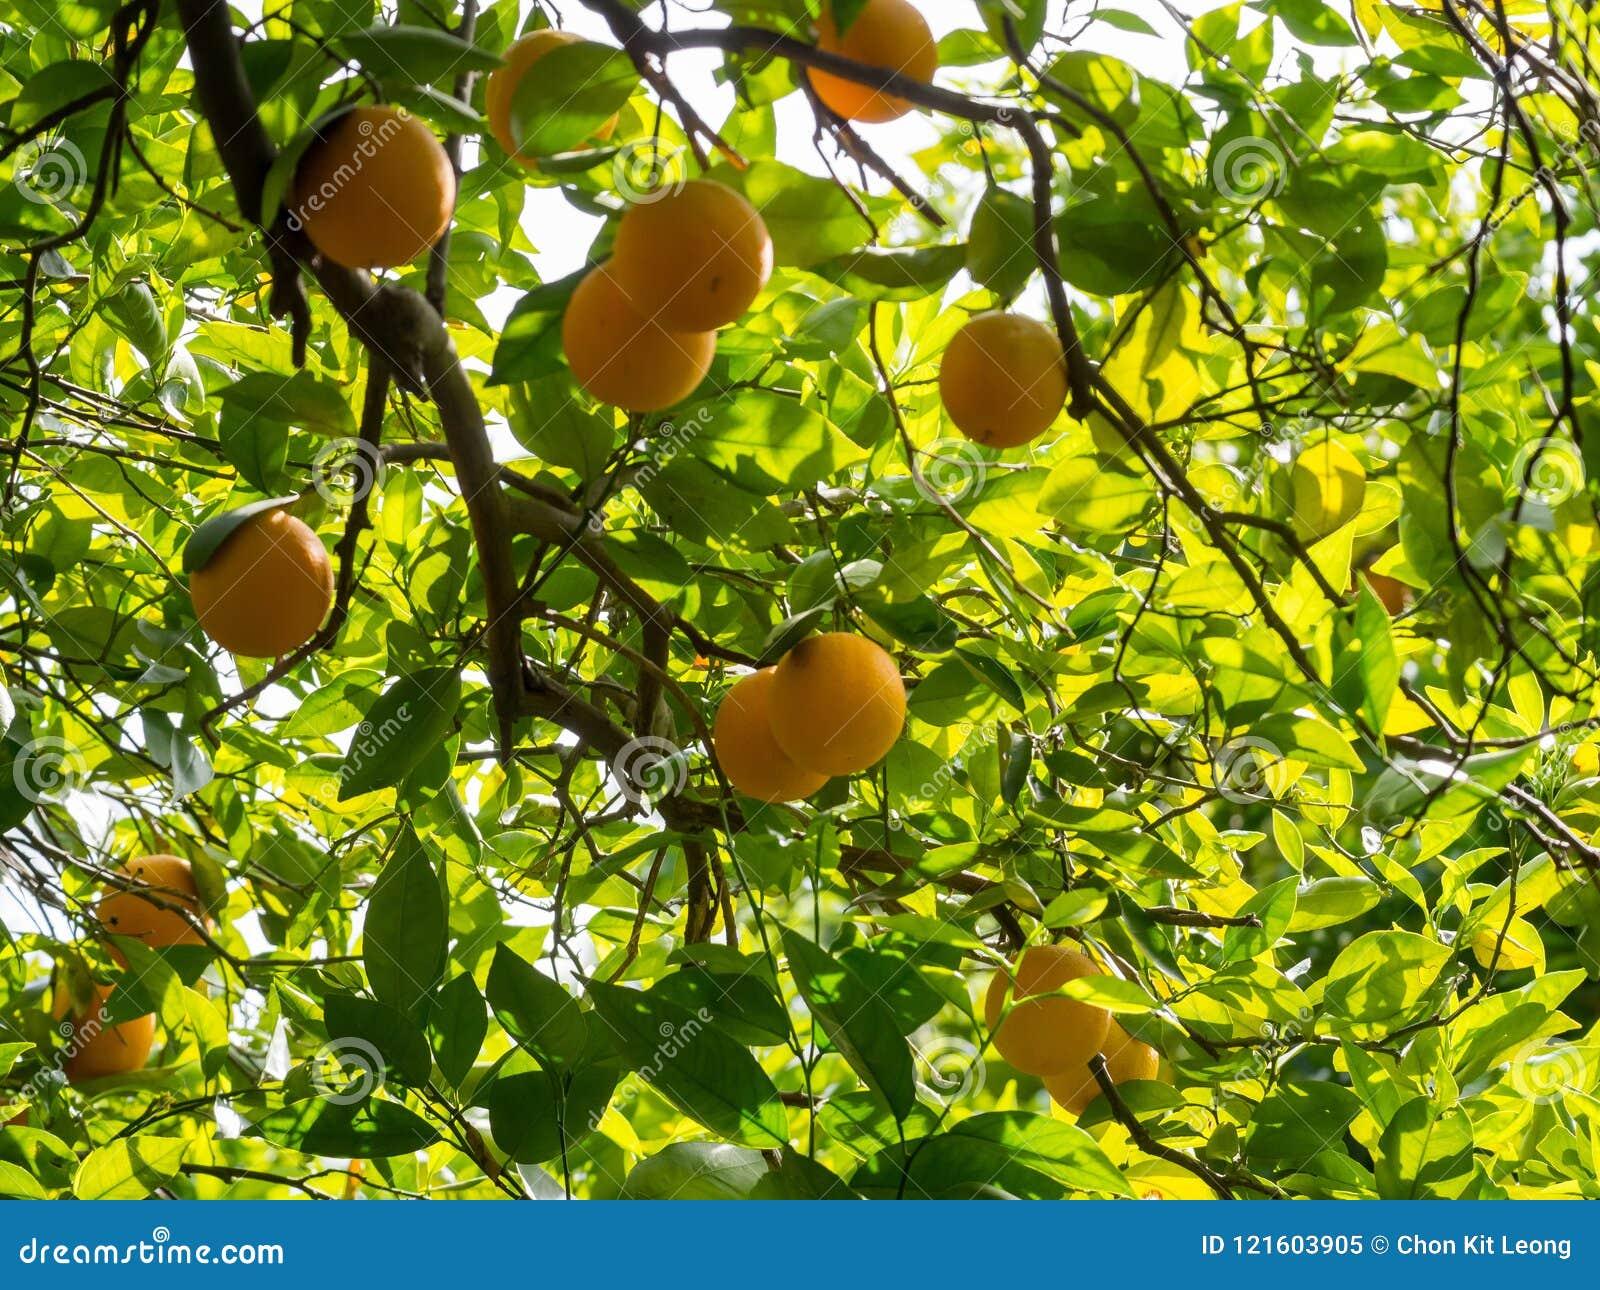 Mature fruit trees sold in california